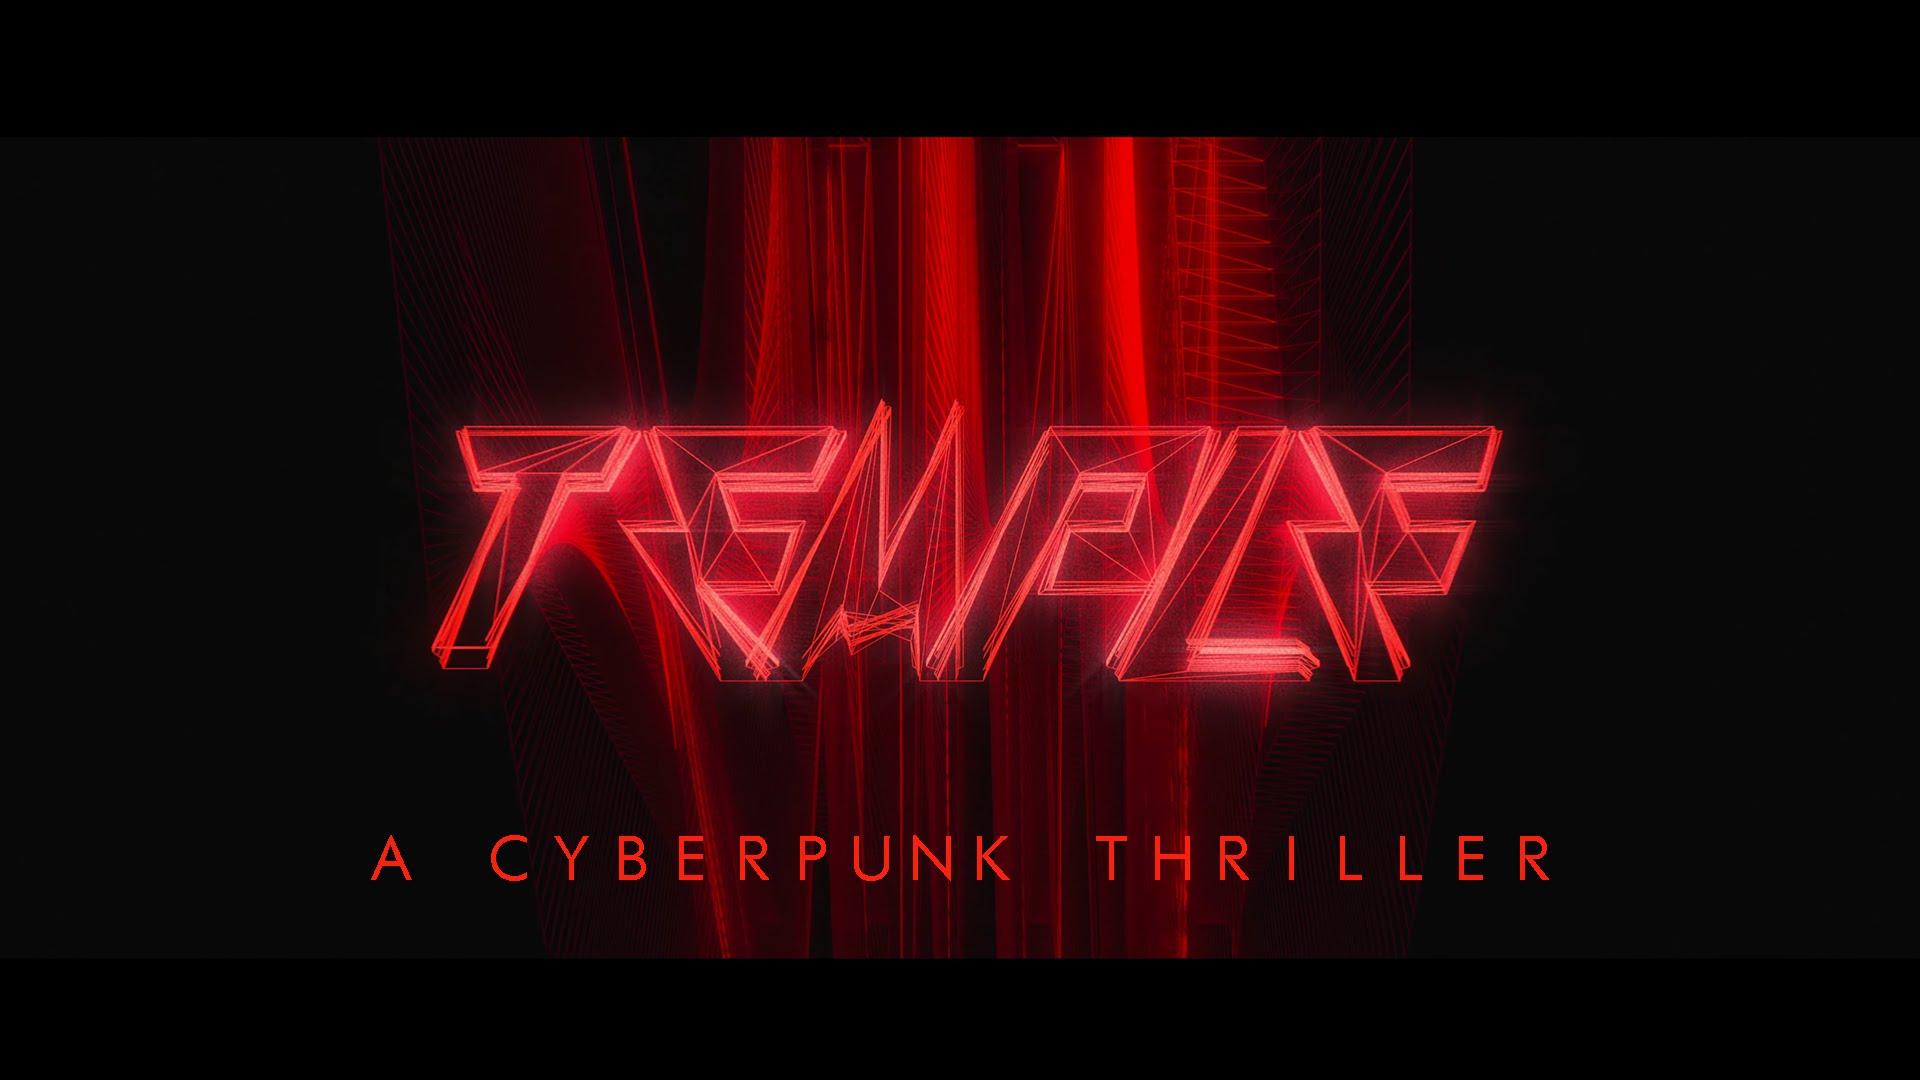 Temple+%5BA+Cyberpunk+Thriller%5D - Top Ten Retro Themed Movies/ TV Shows of 2016